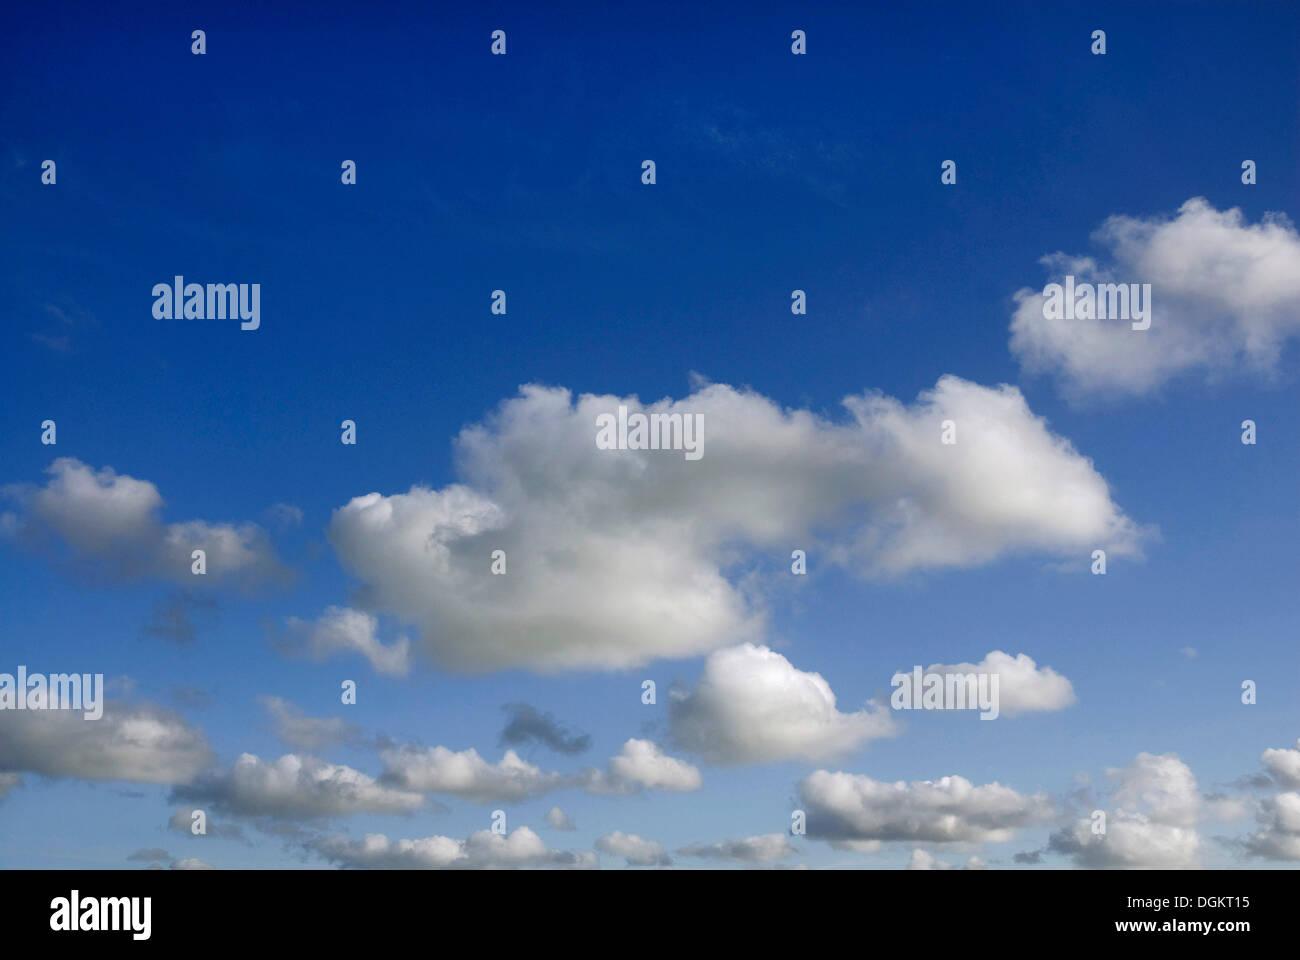 Cumulus clouds in the sky - Stock Image